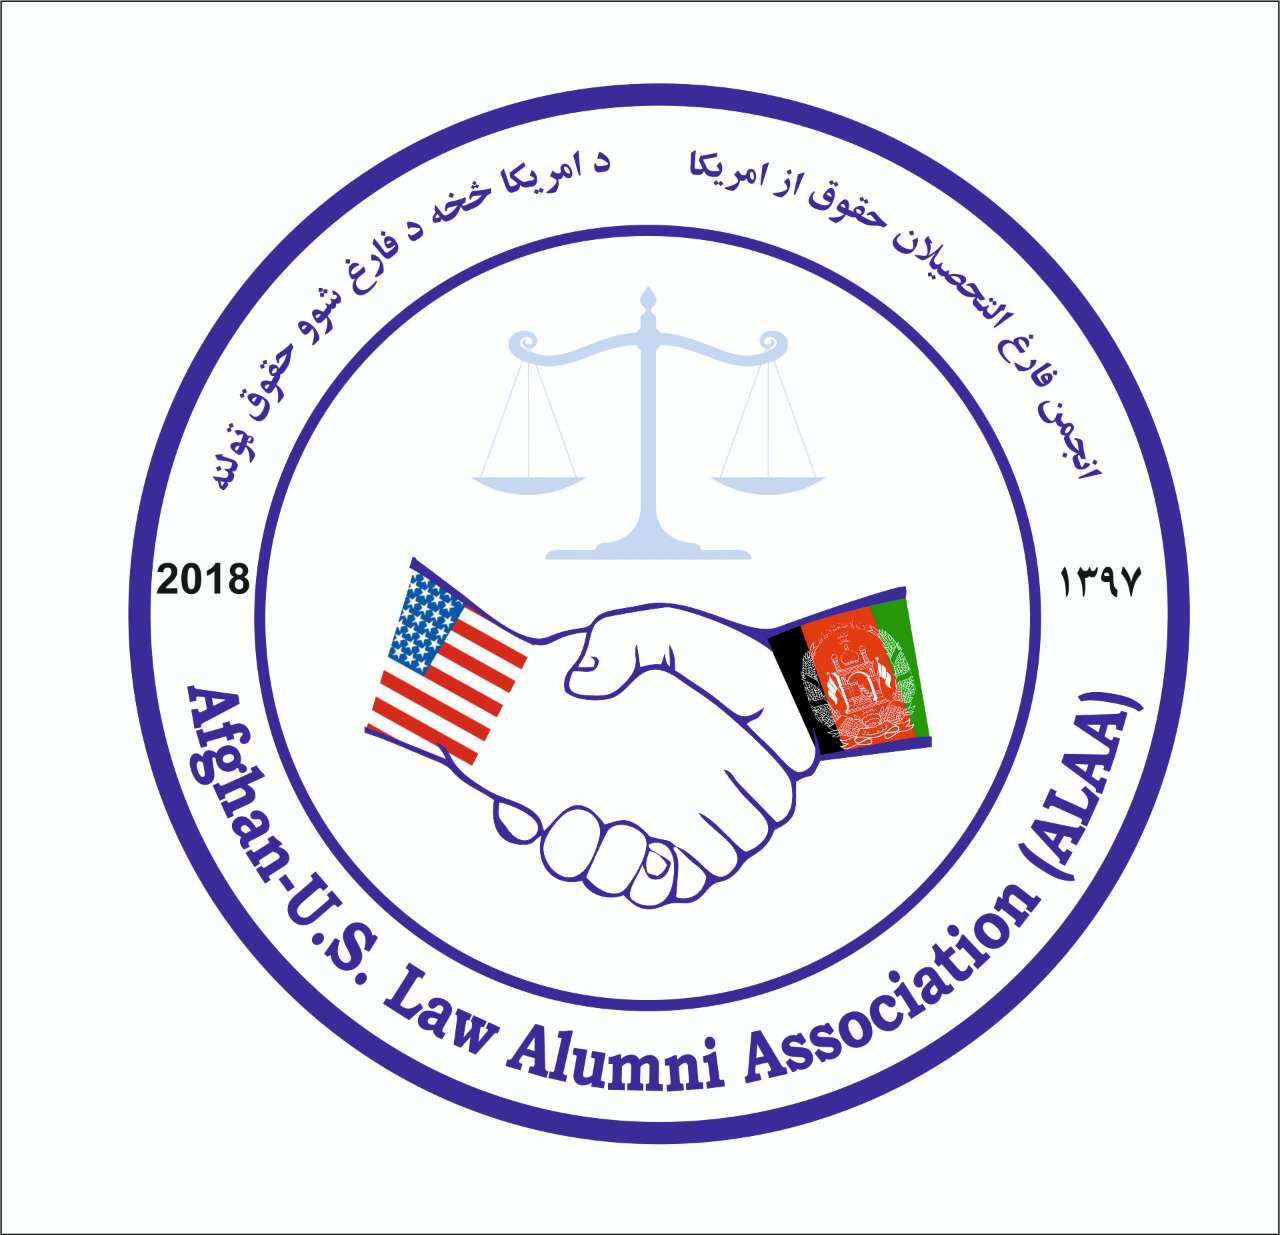 ALAA logo 3 languages